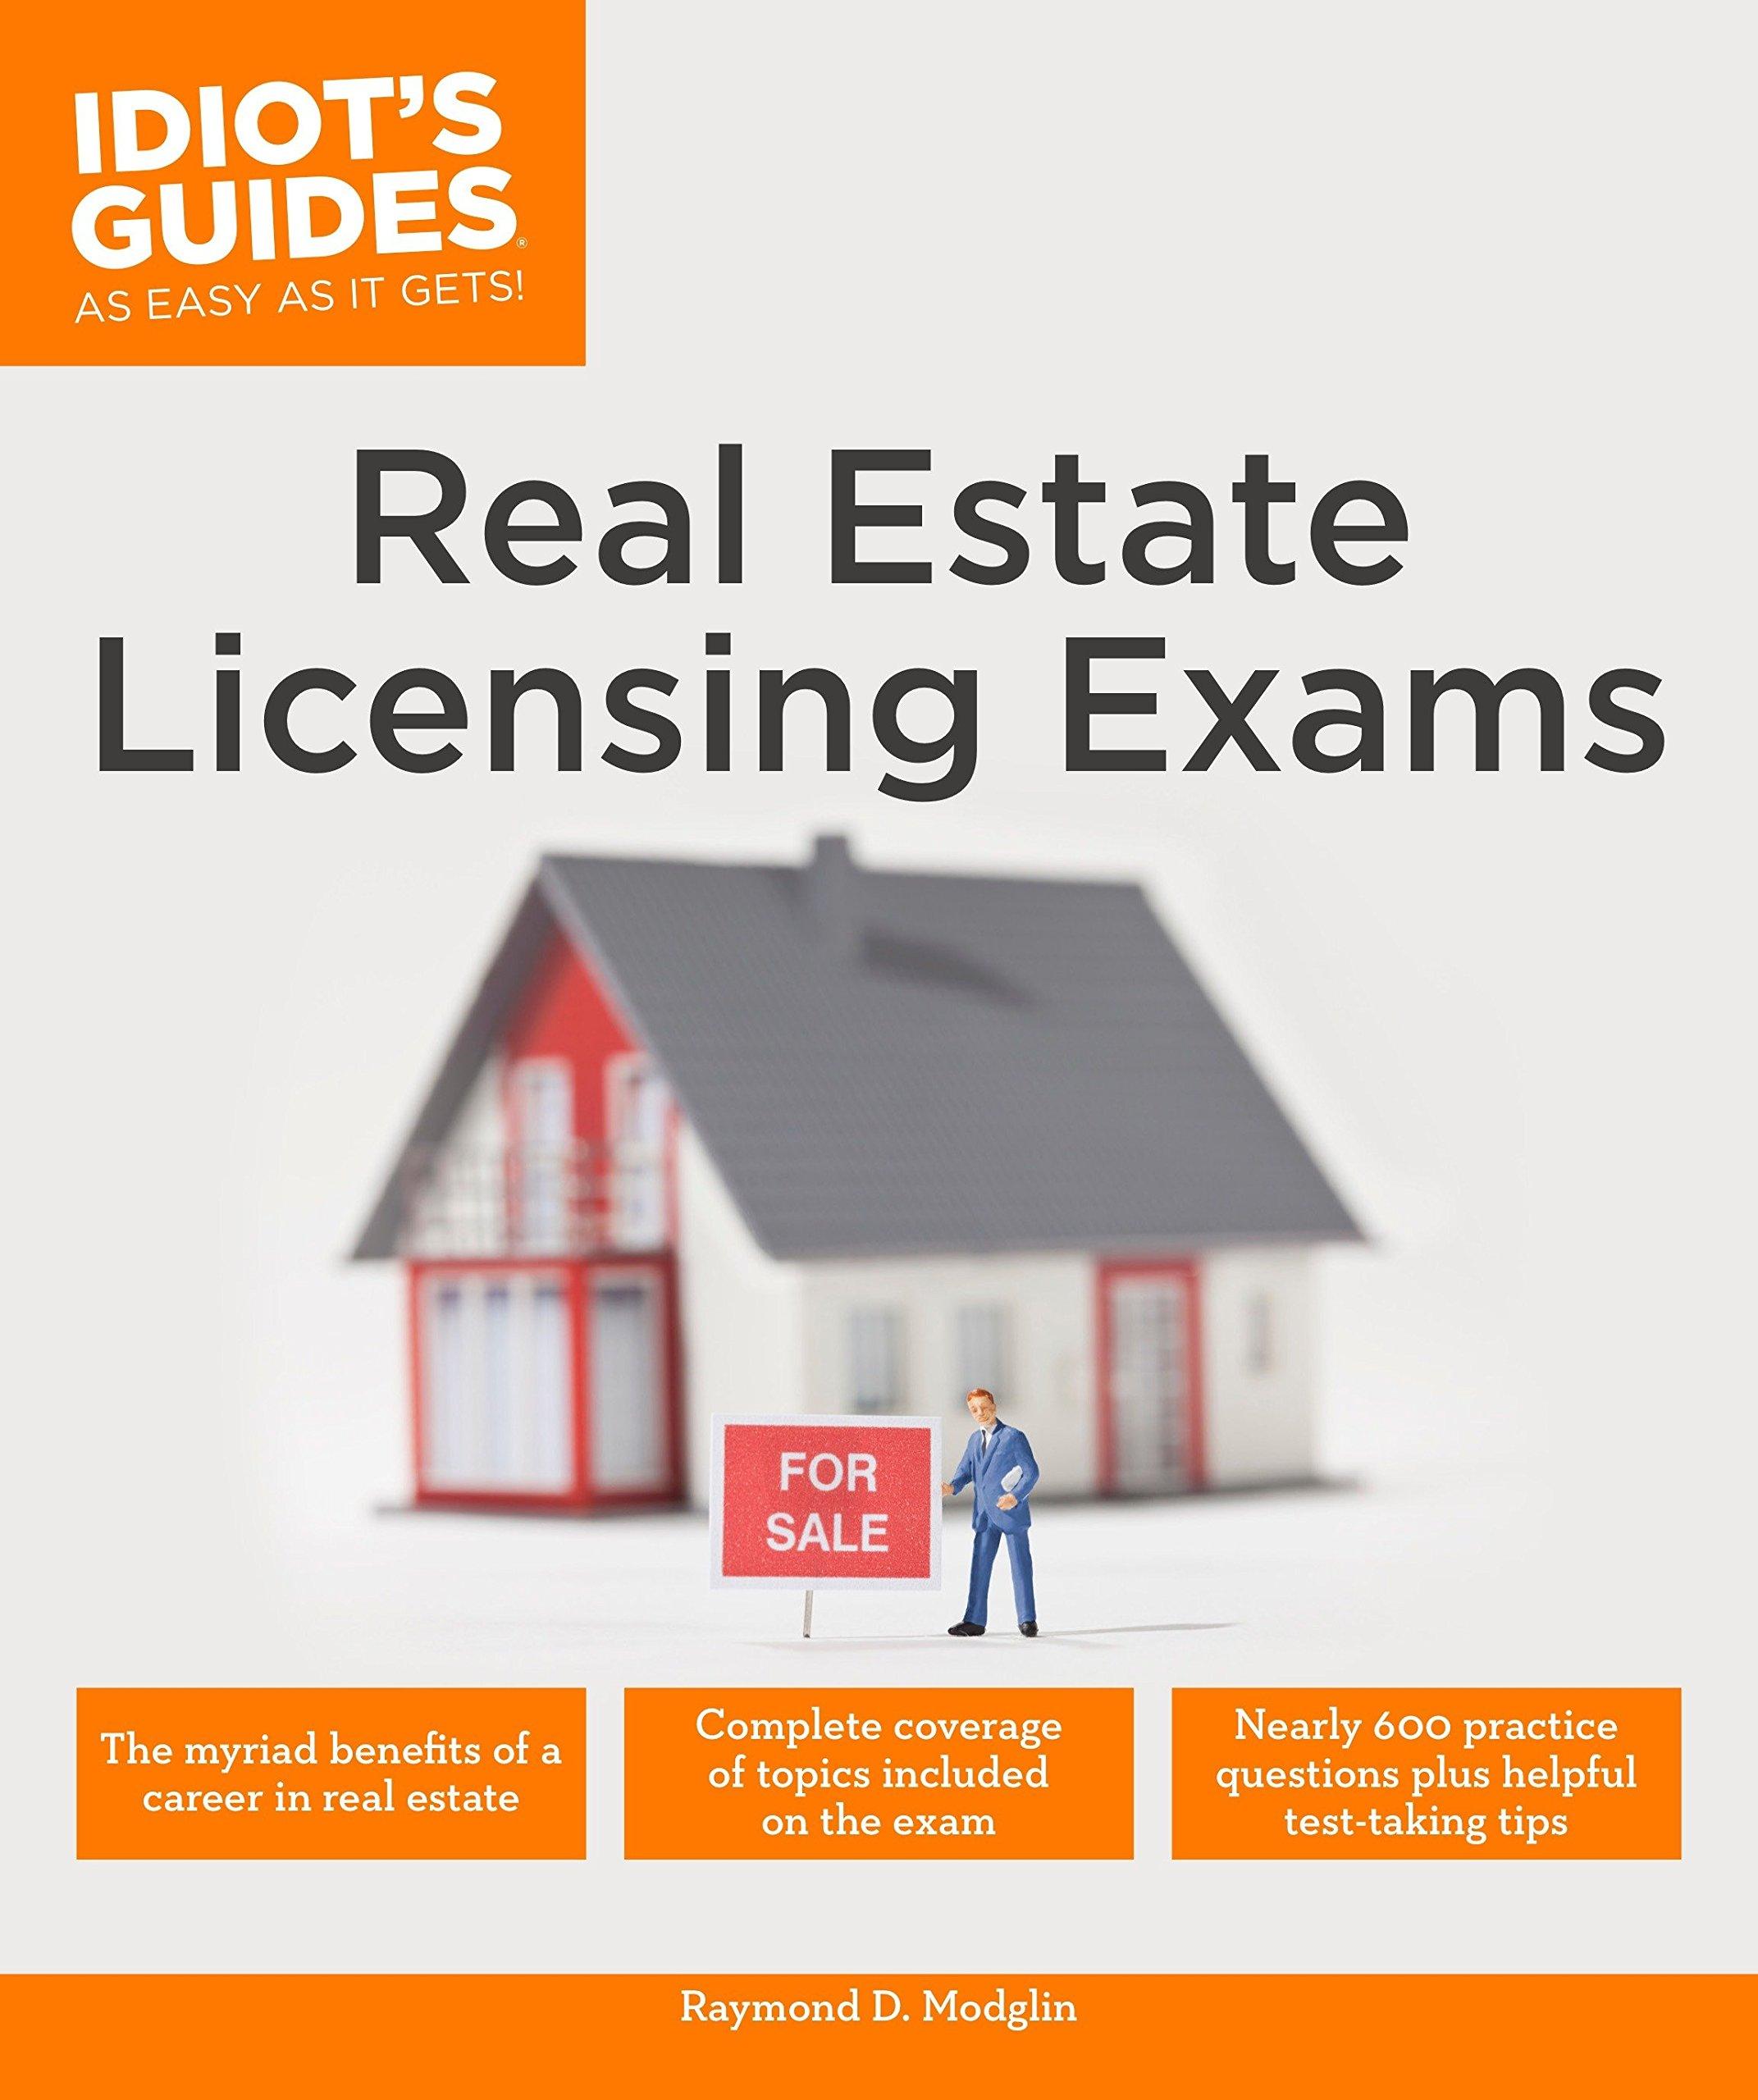 Real Estate Licensing Exams (Idiot's Guides): Raymond D. Modglin:  9781465462749: Amazon.com: Books